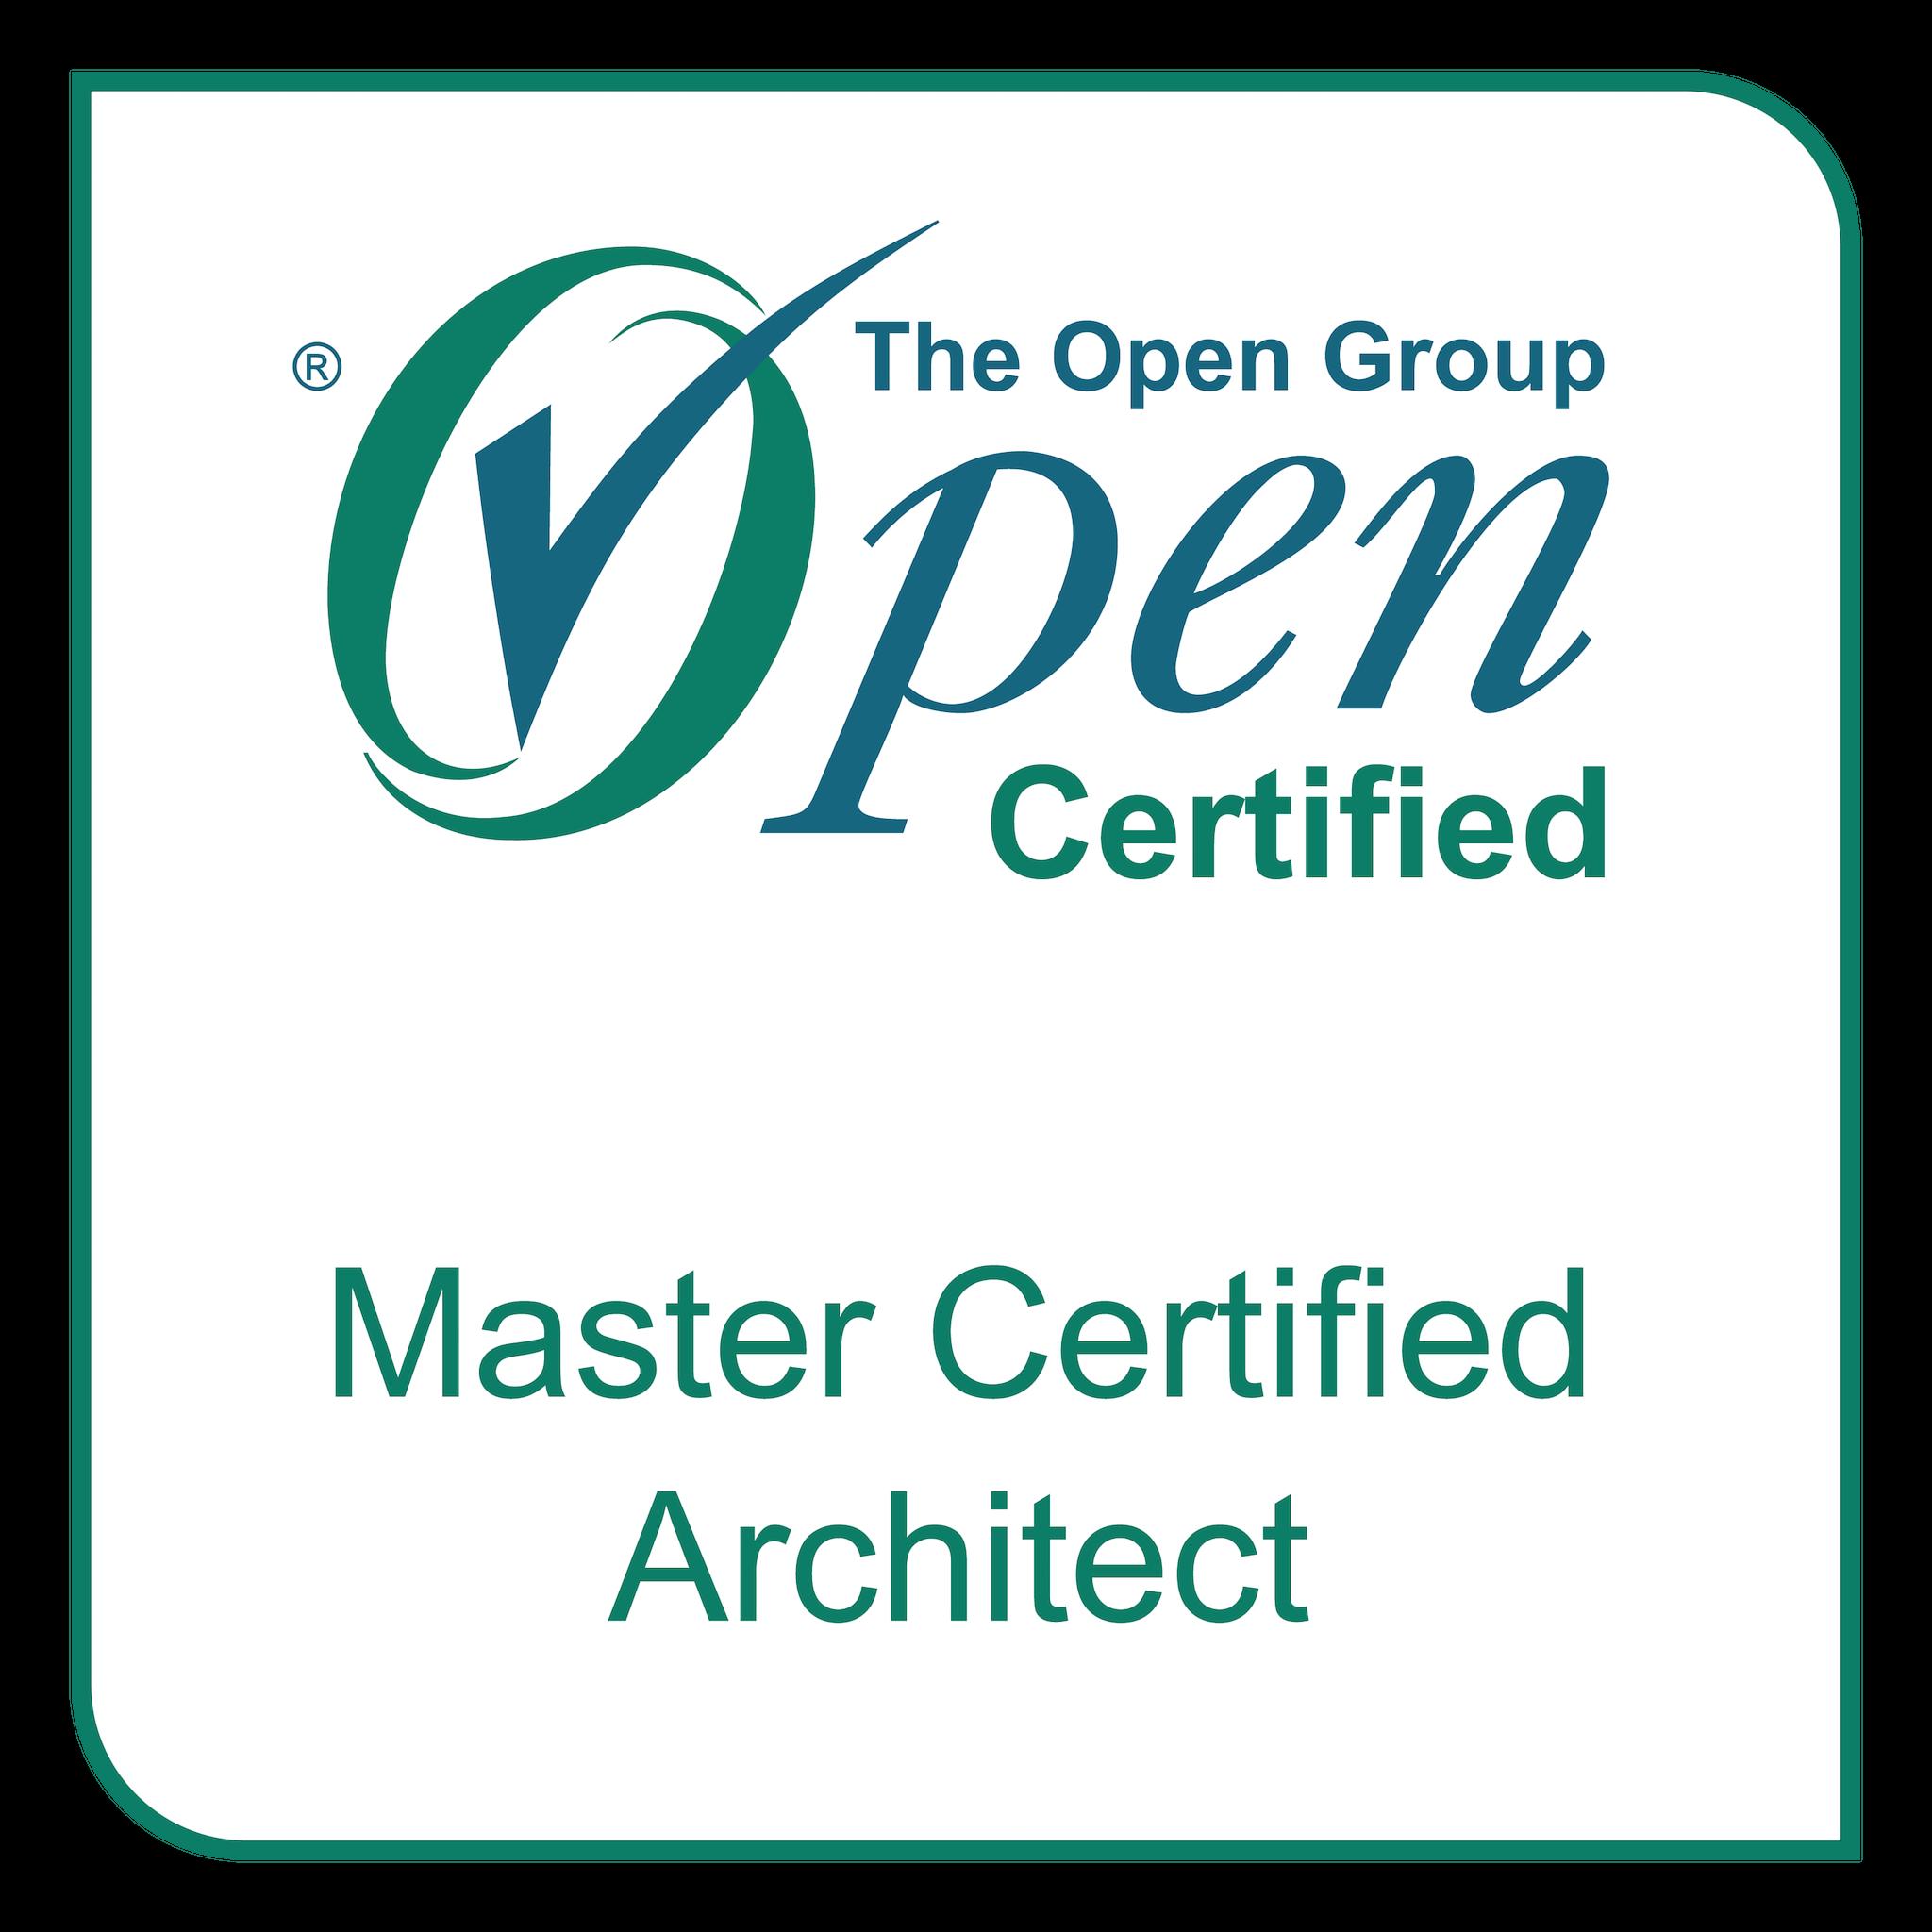 Professional Certification: Level 2 - Master Certified Enterprise Architect